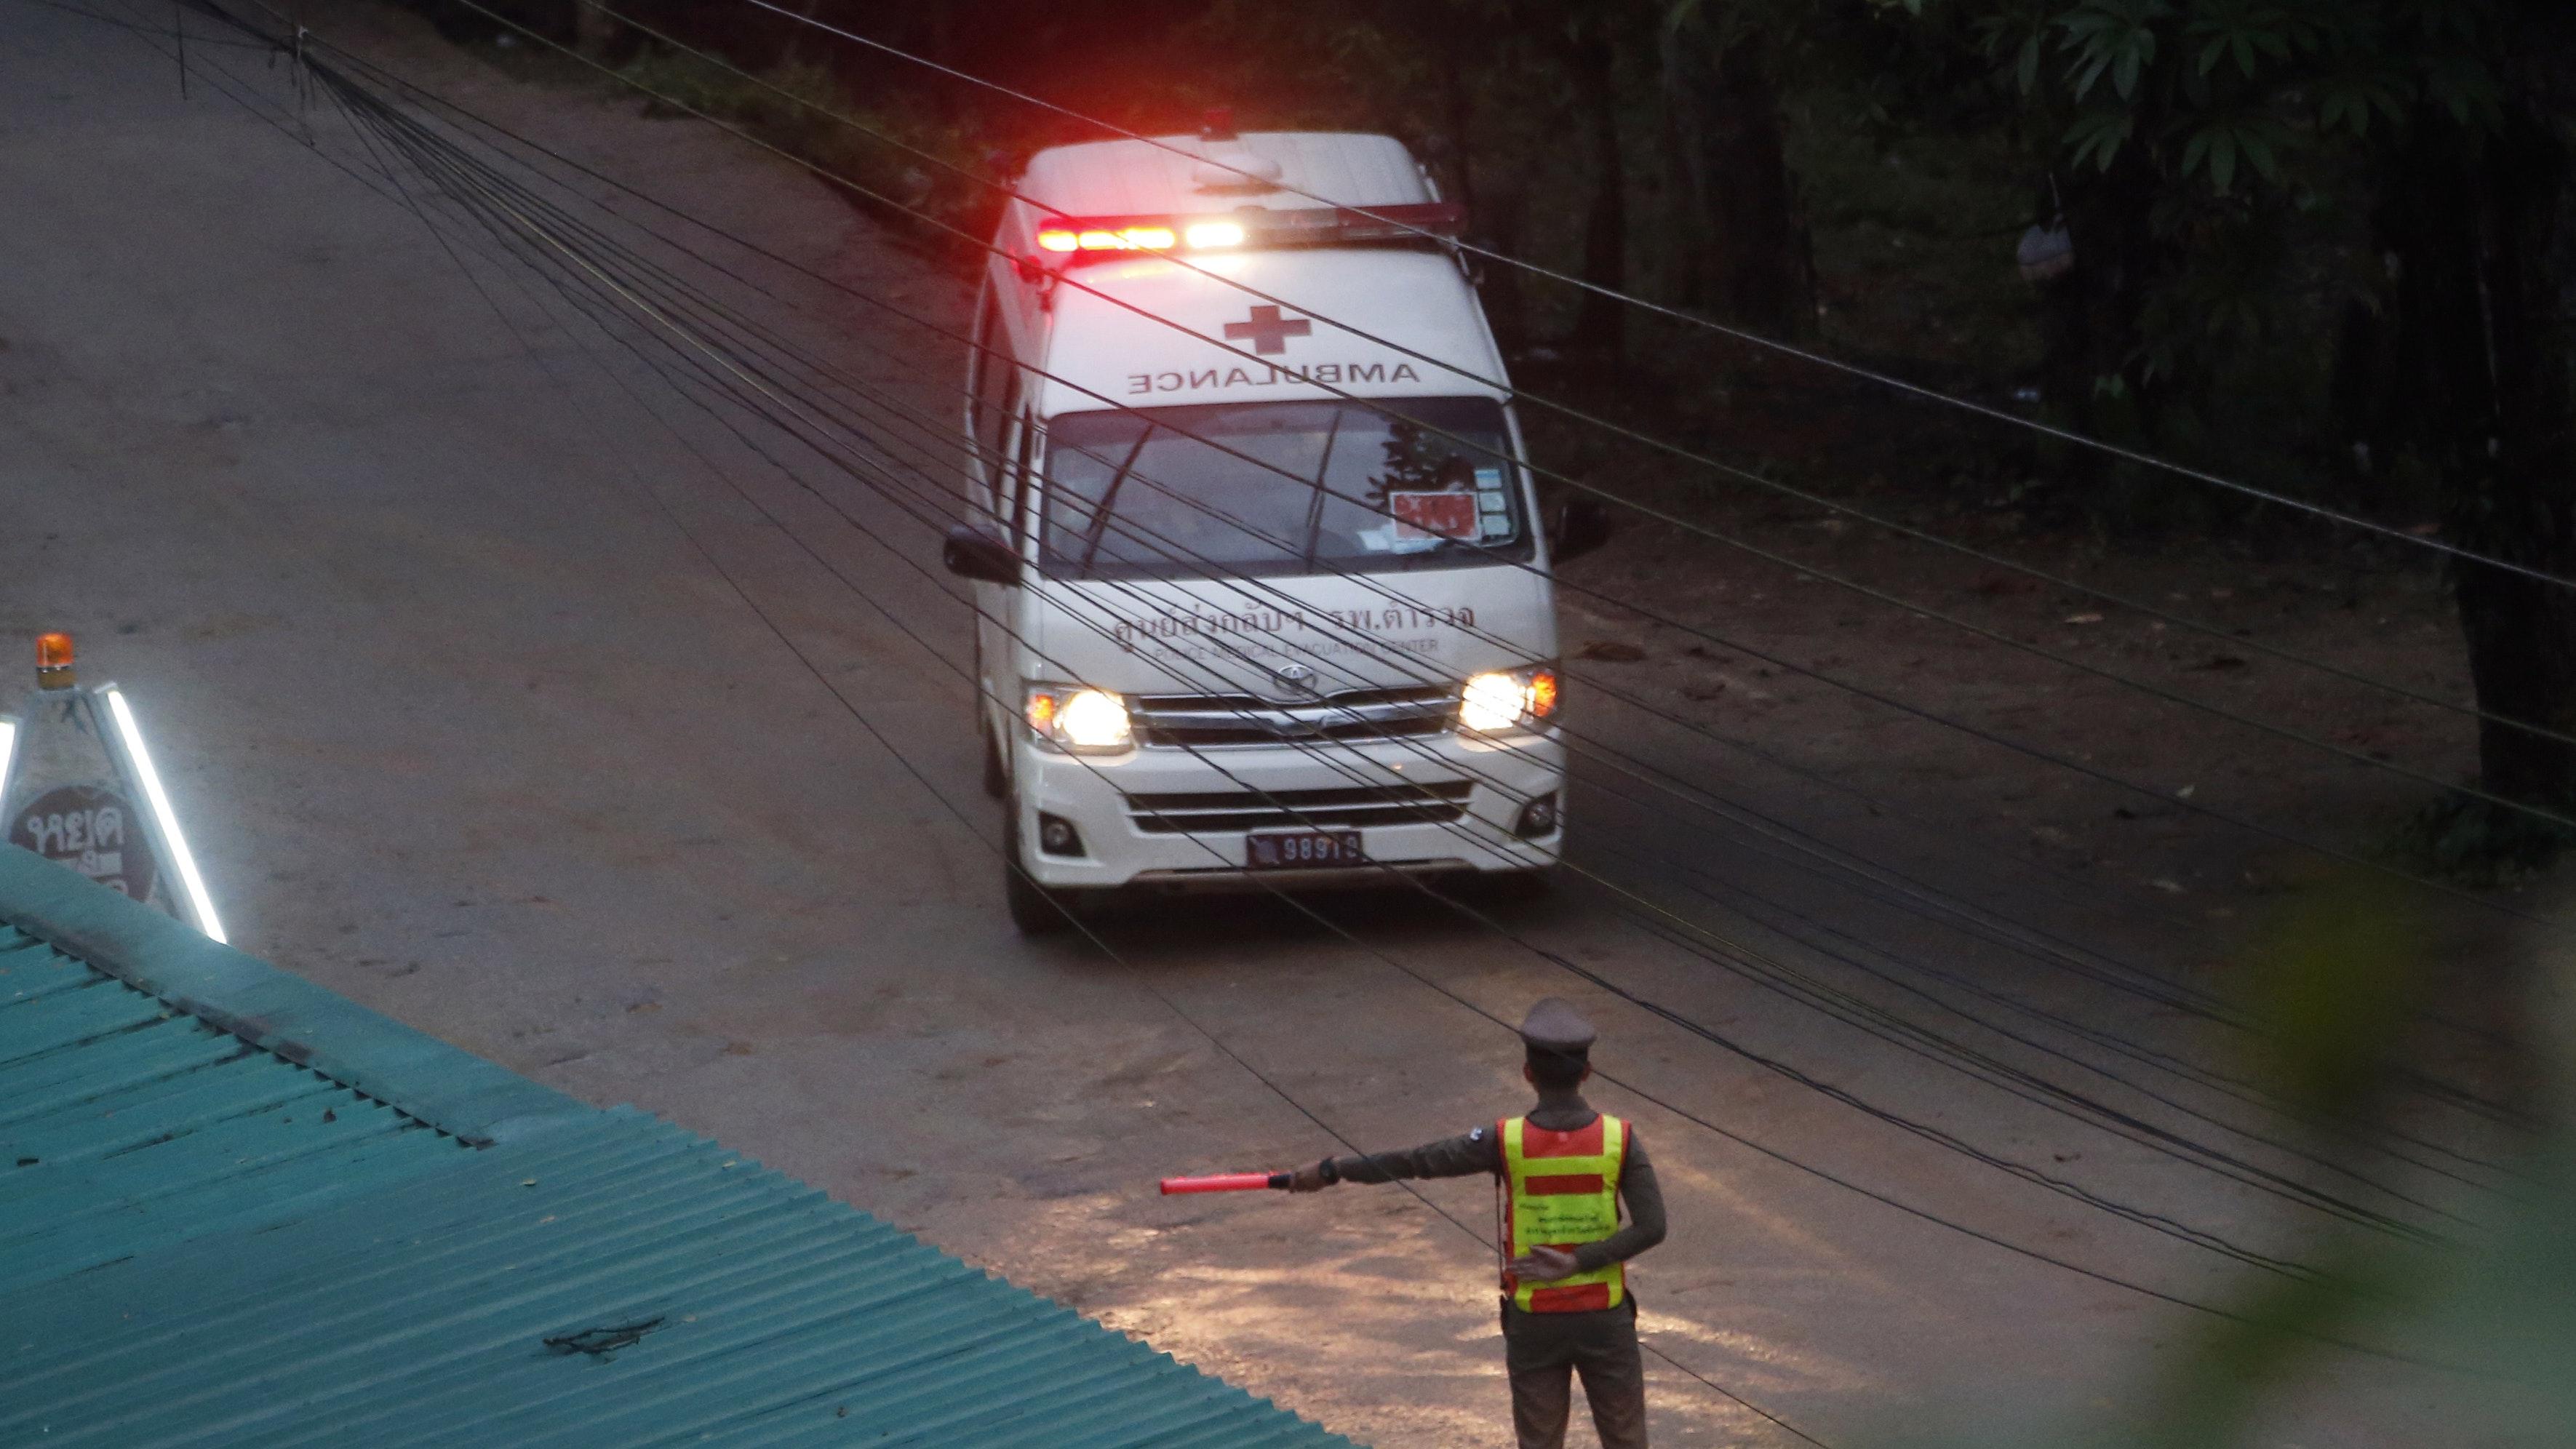 thai cave rescue operation - photo #11